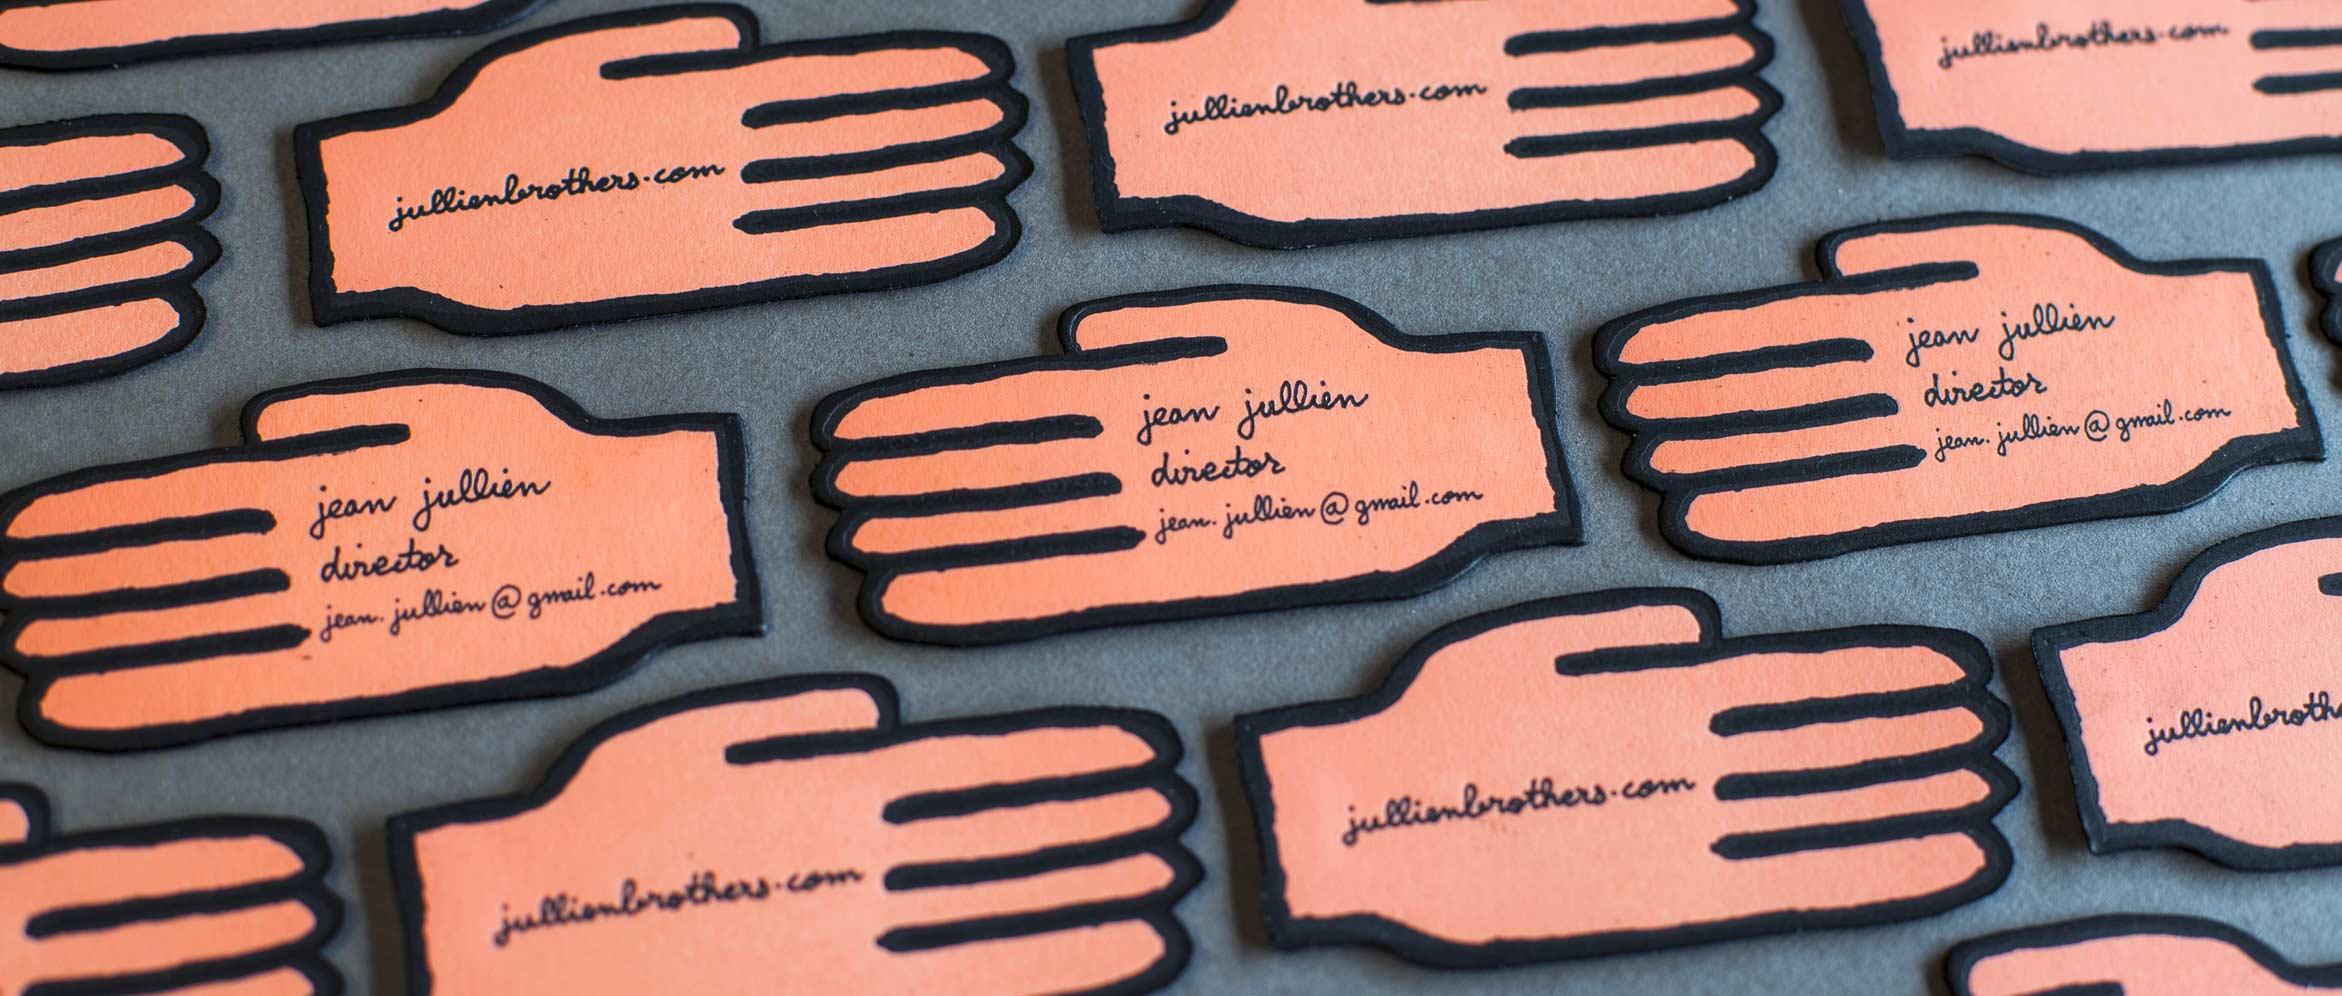 Concrete Business Cards   Jukebox Print